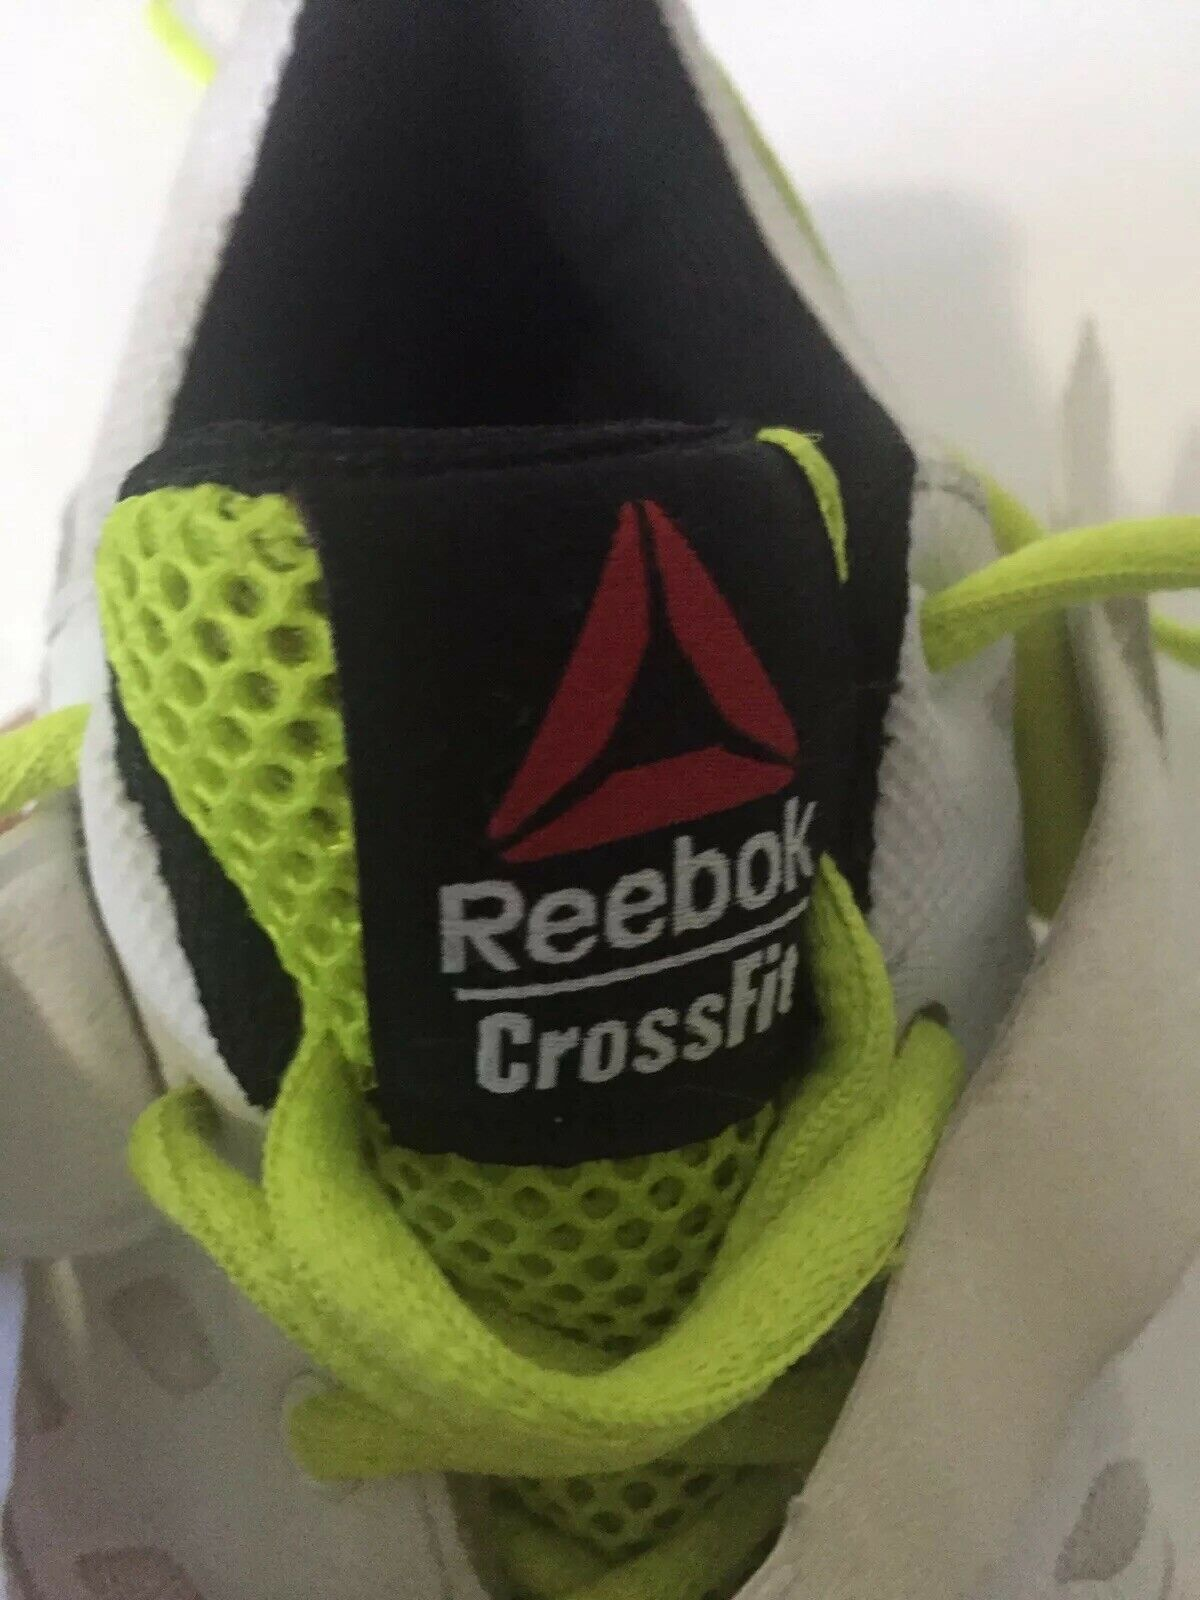 Reebok Crossfit Womens Size 6.5 Lifters Plus 2.0 CF74 Squat U Form Sneakers